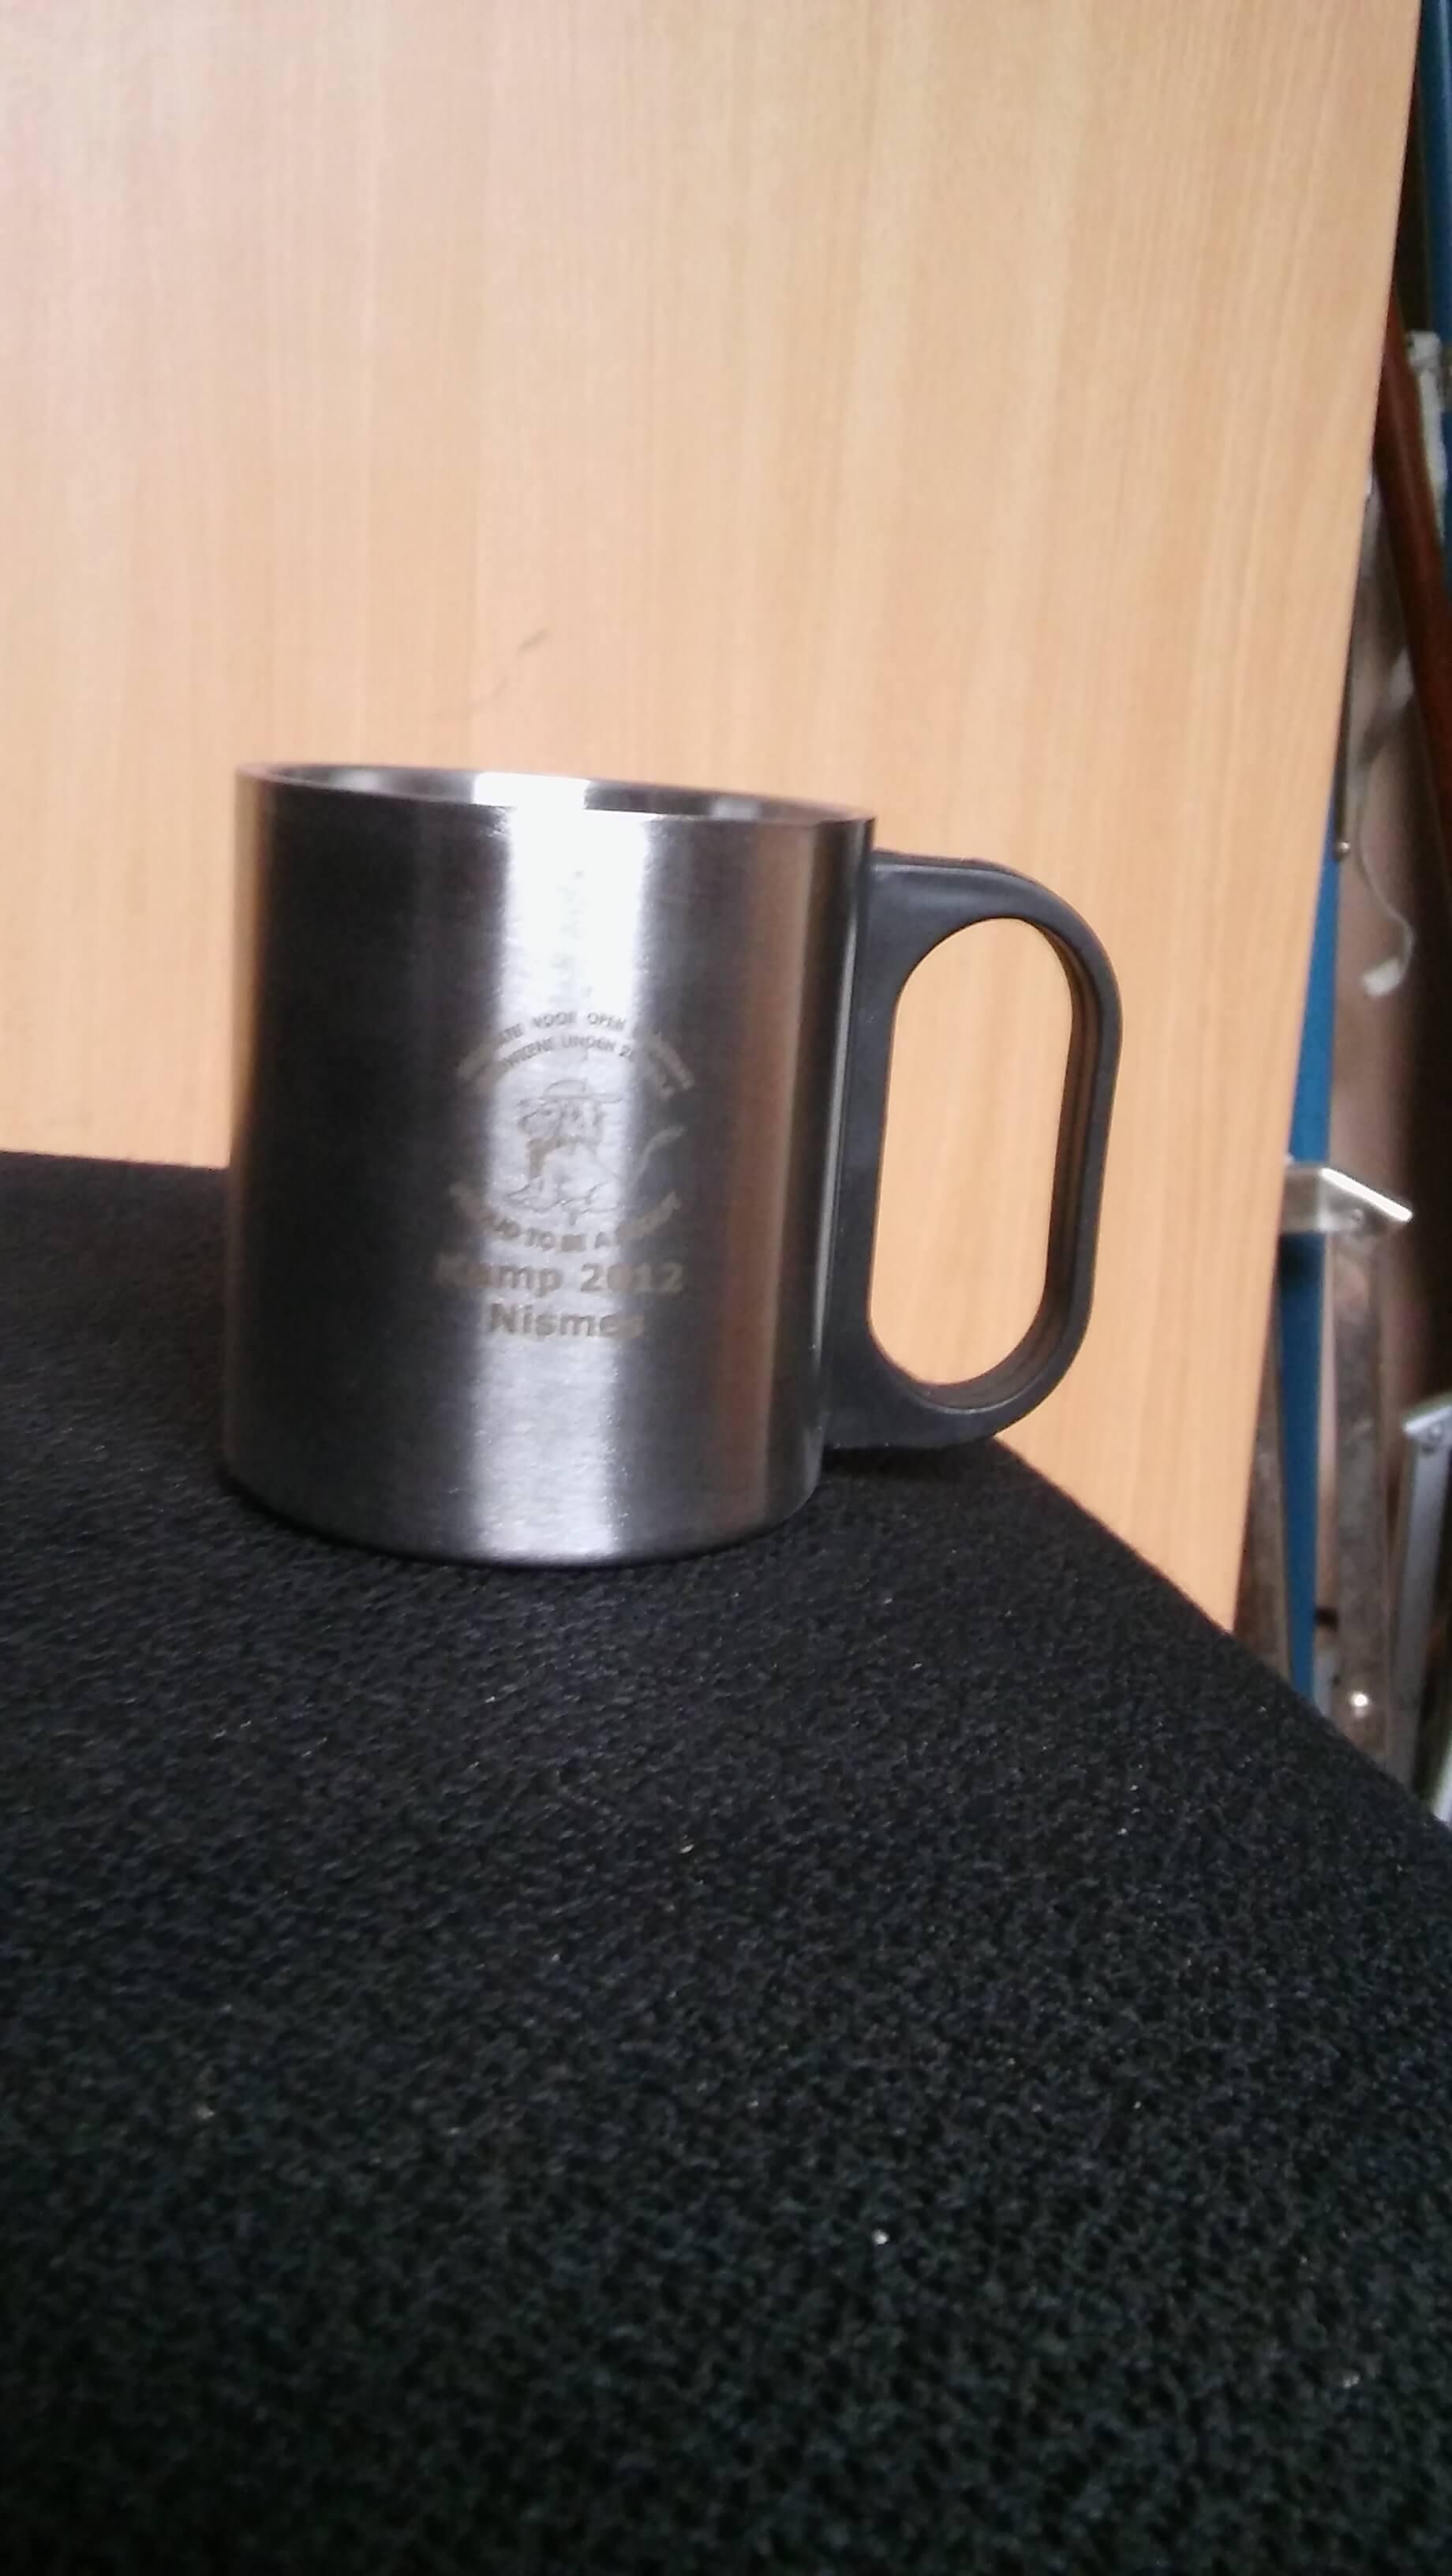 Leeuwkens koffiebeker Image